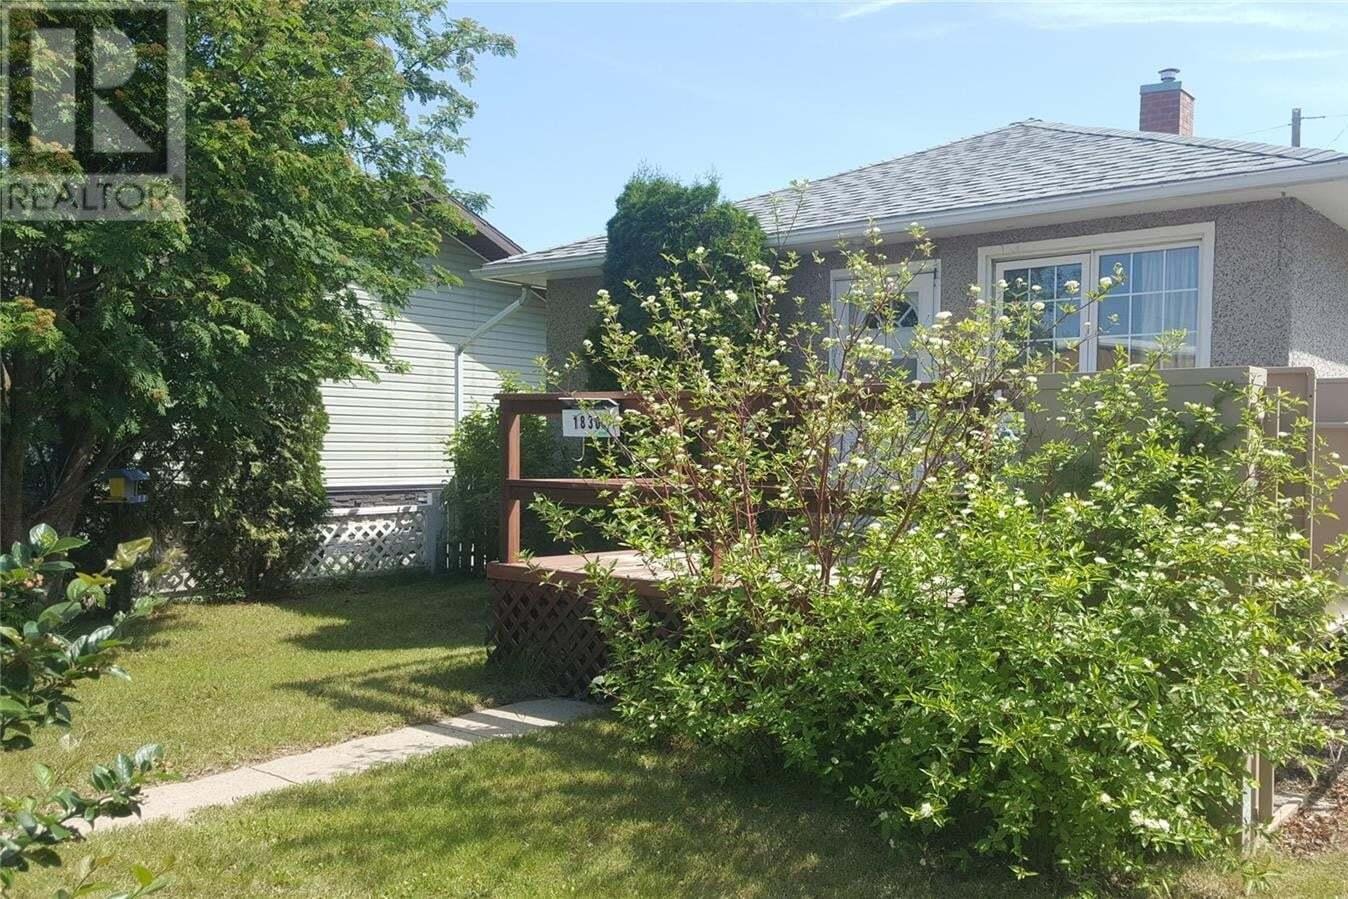 House for sale at 1830 C Ave N Saskatoon Saskatchewan - MLS: SK826744